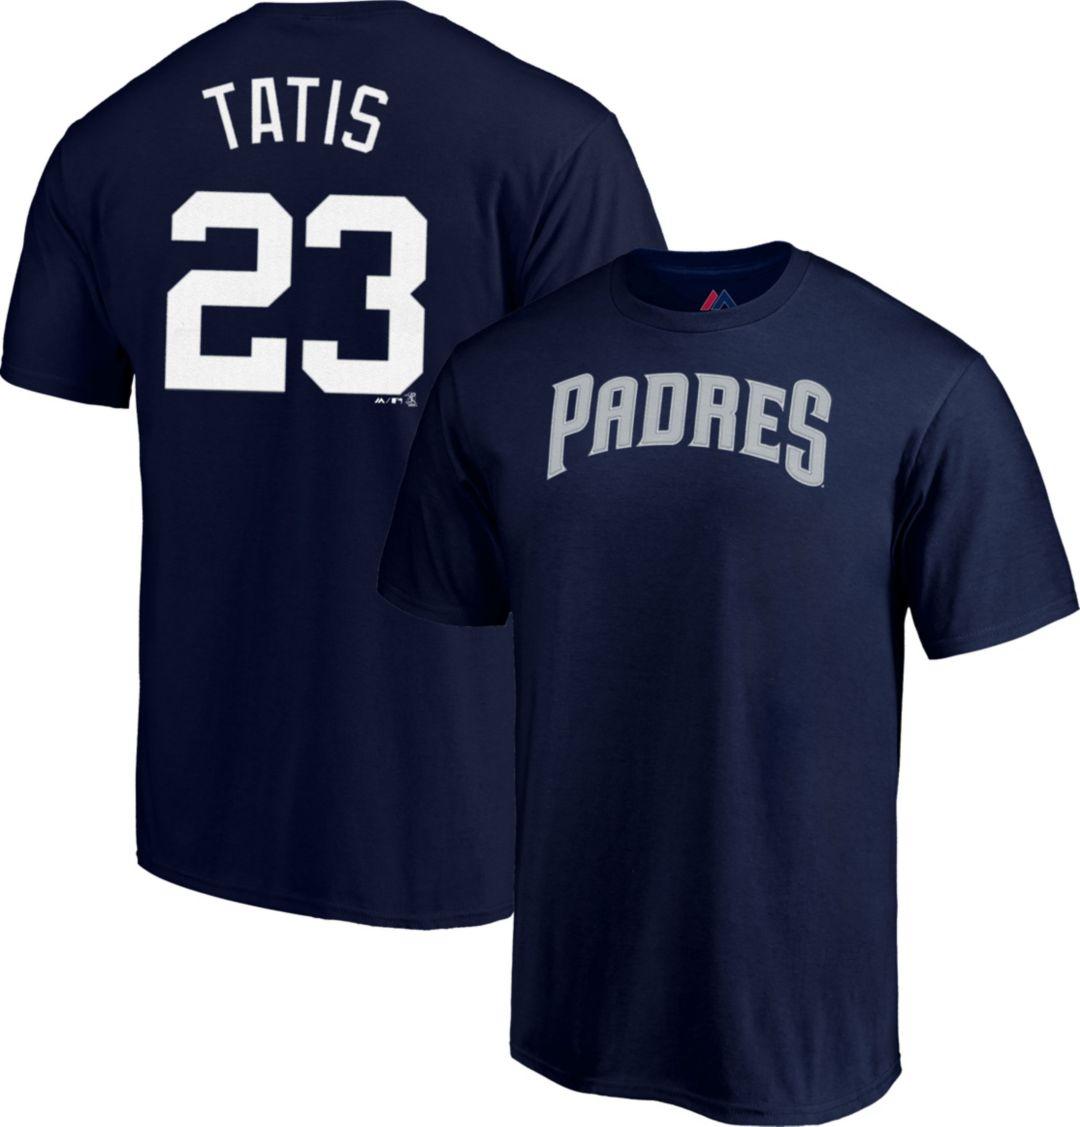 new style 87b40 01724 Majestic Youth San Diego Padres Fernando Tatis Jr. #23 Navy T-Shirt